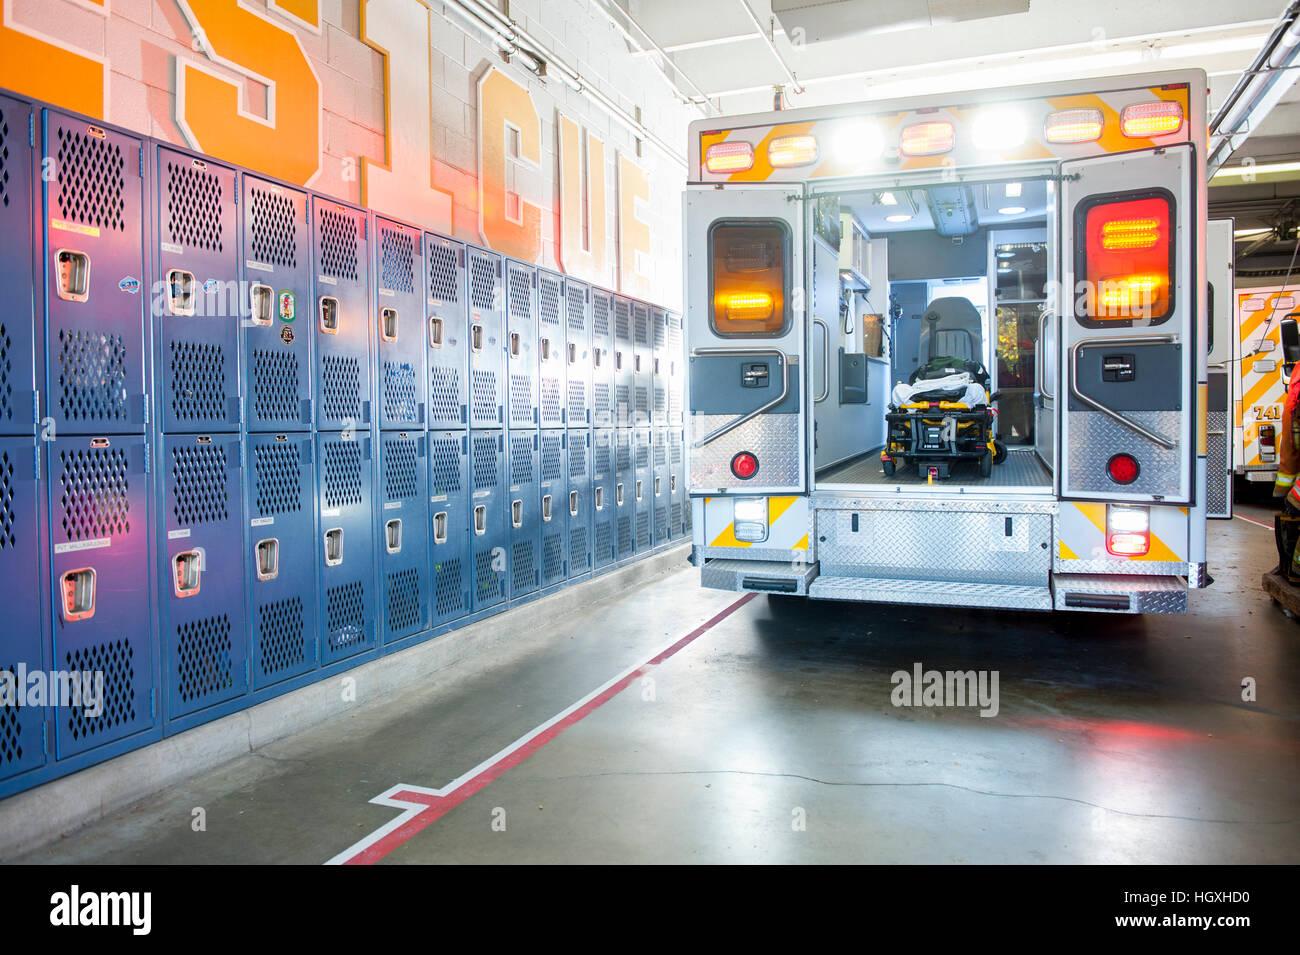 usa-maryland-md-ambulance-parked-inside-